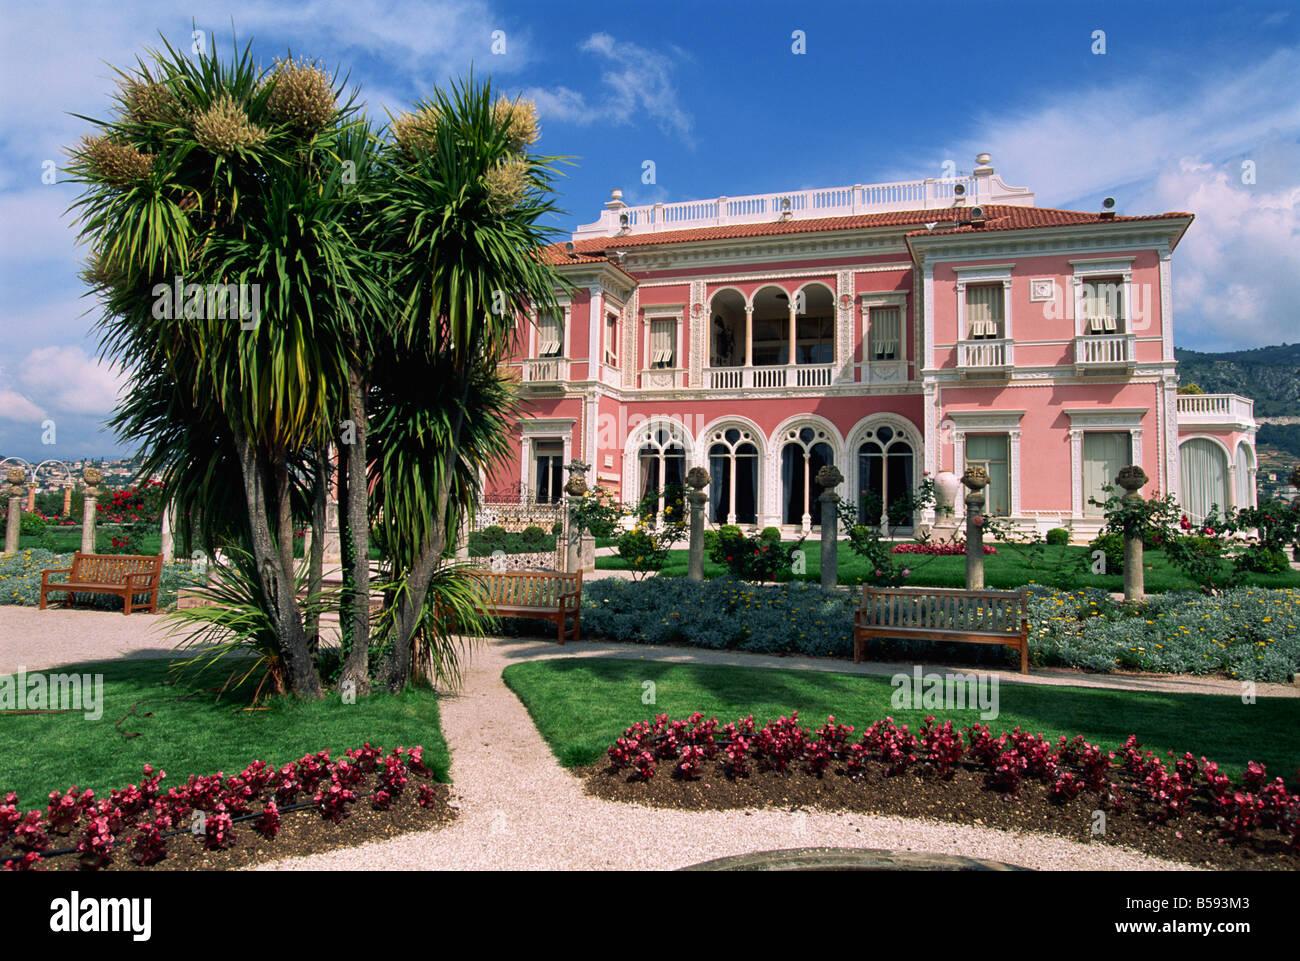 Gardens and villa Ephrussi de Rothschild at St Jean Cap Ferrat on the Cote da Azur Provence France G Thouvenin - Stock Image